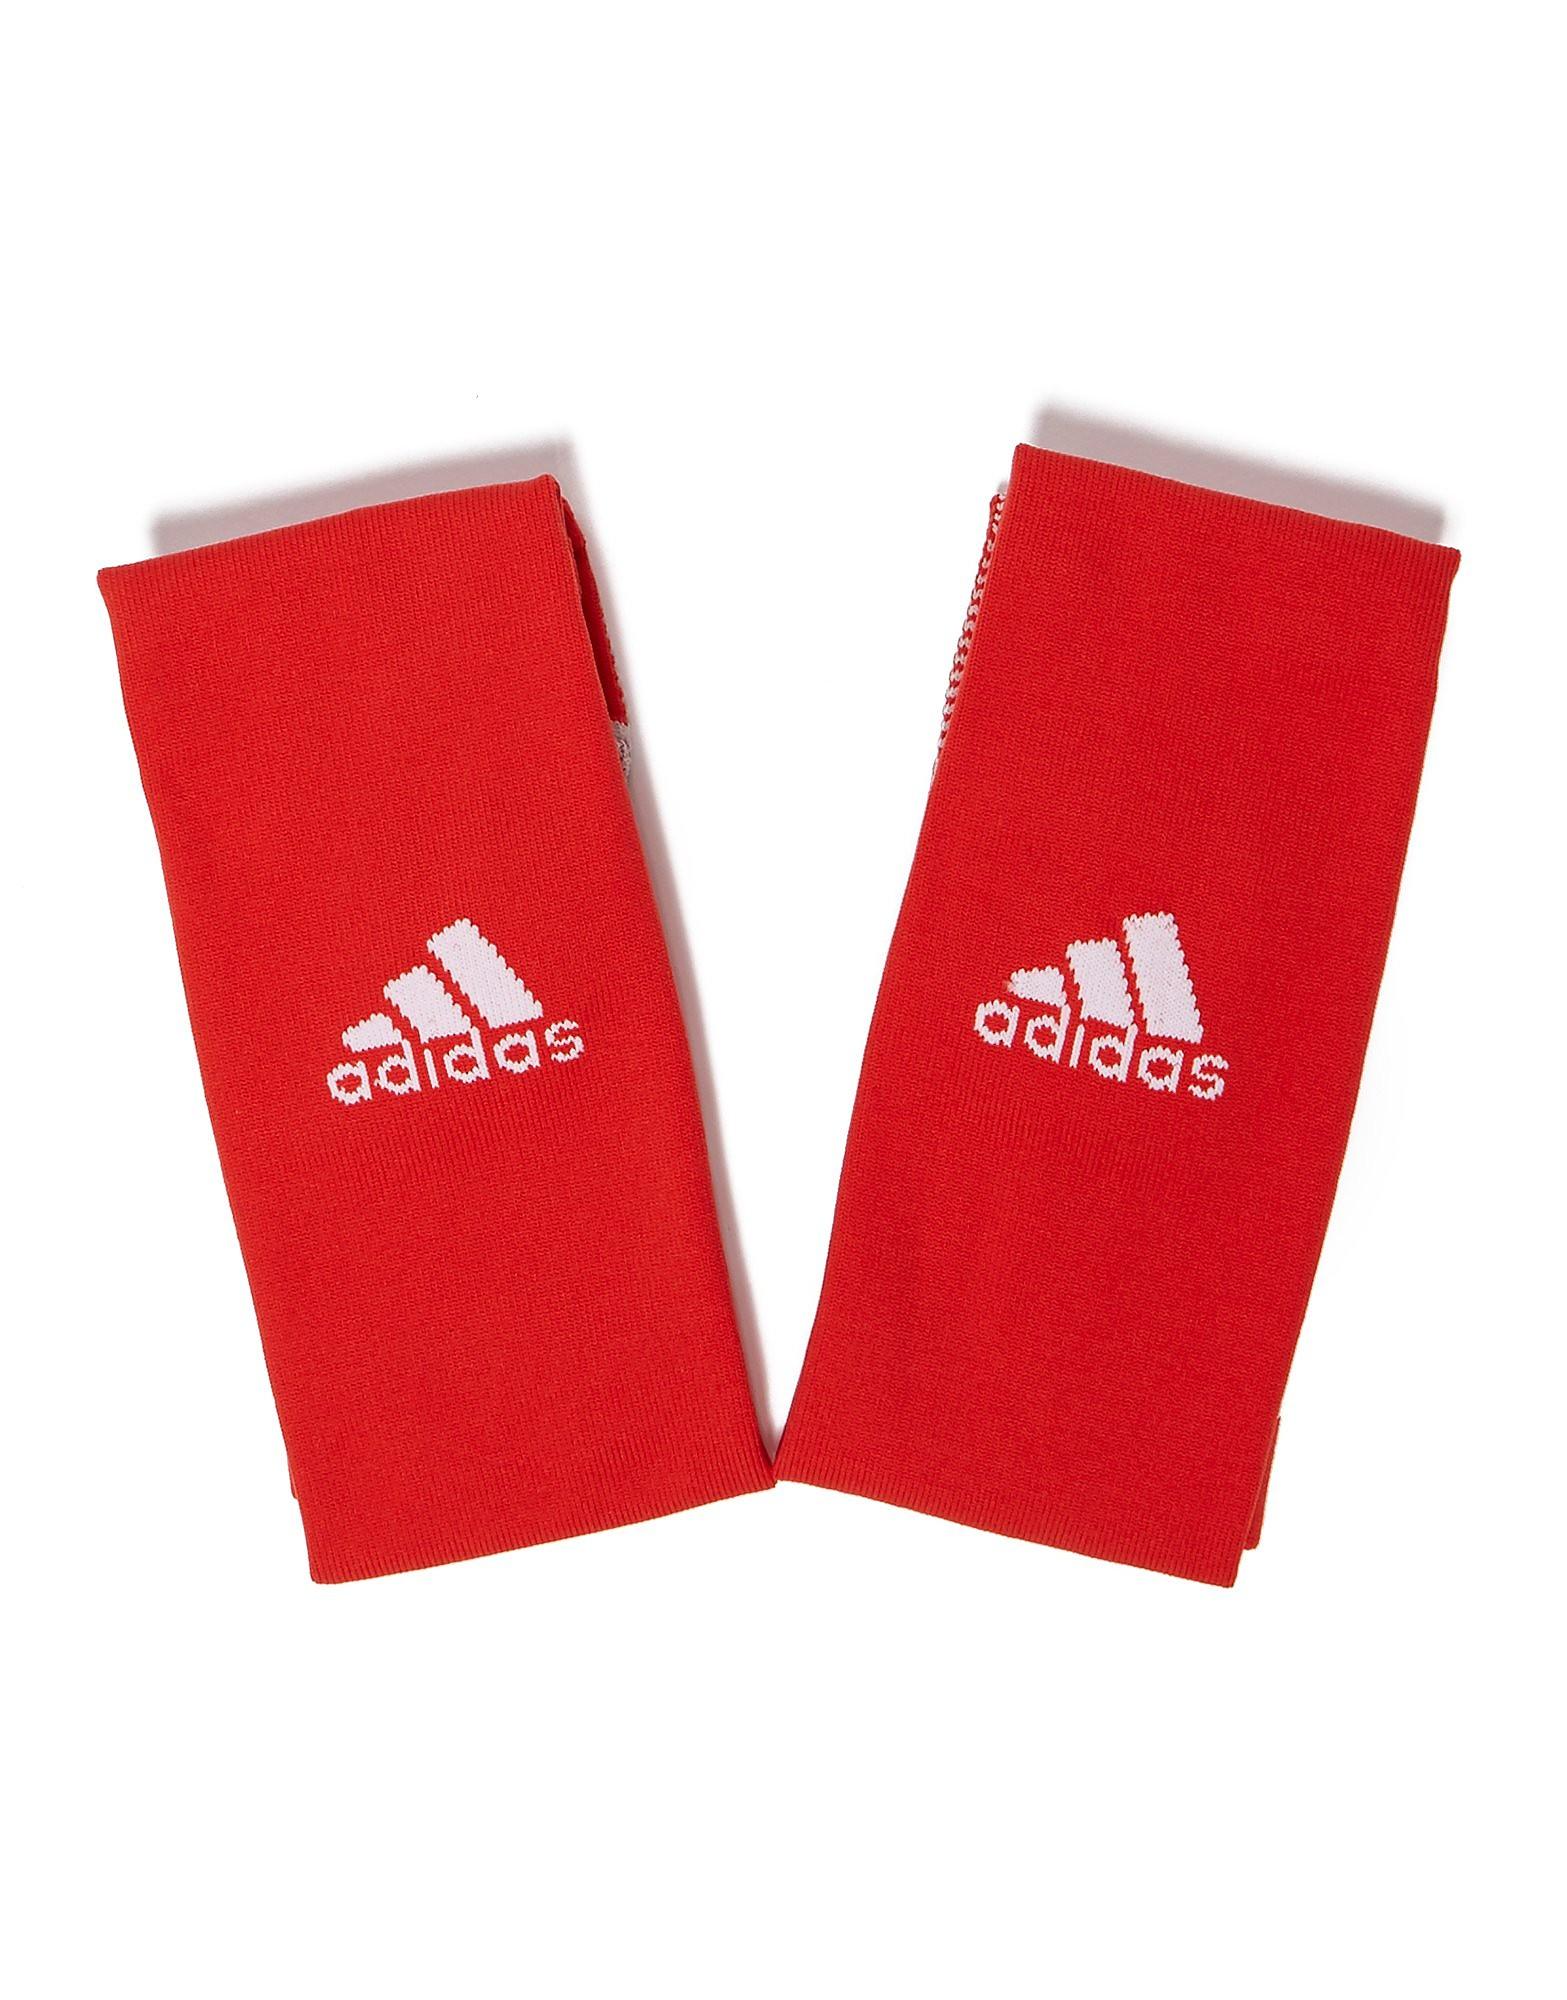 adidas Wales 2017/18 Home Socks